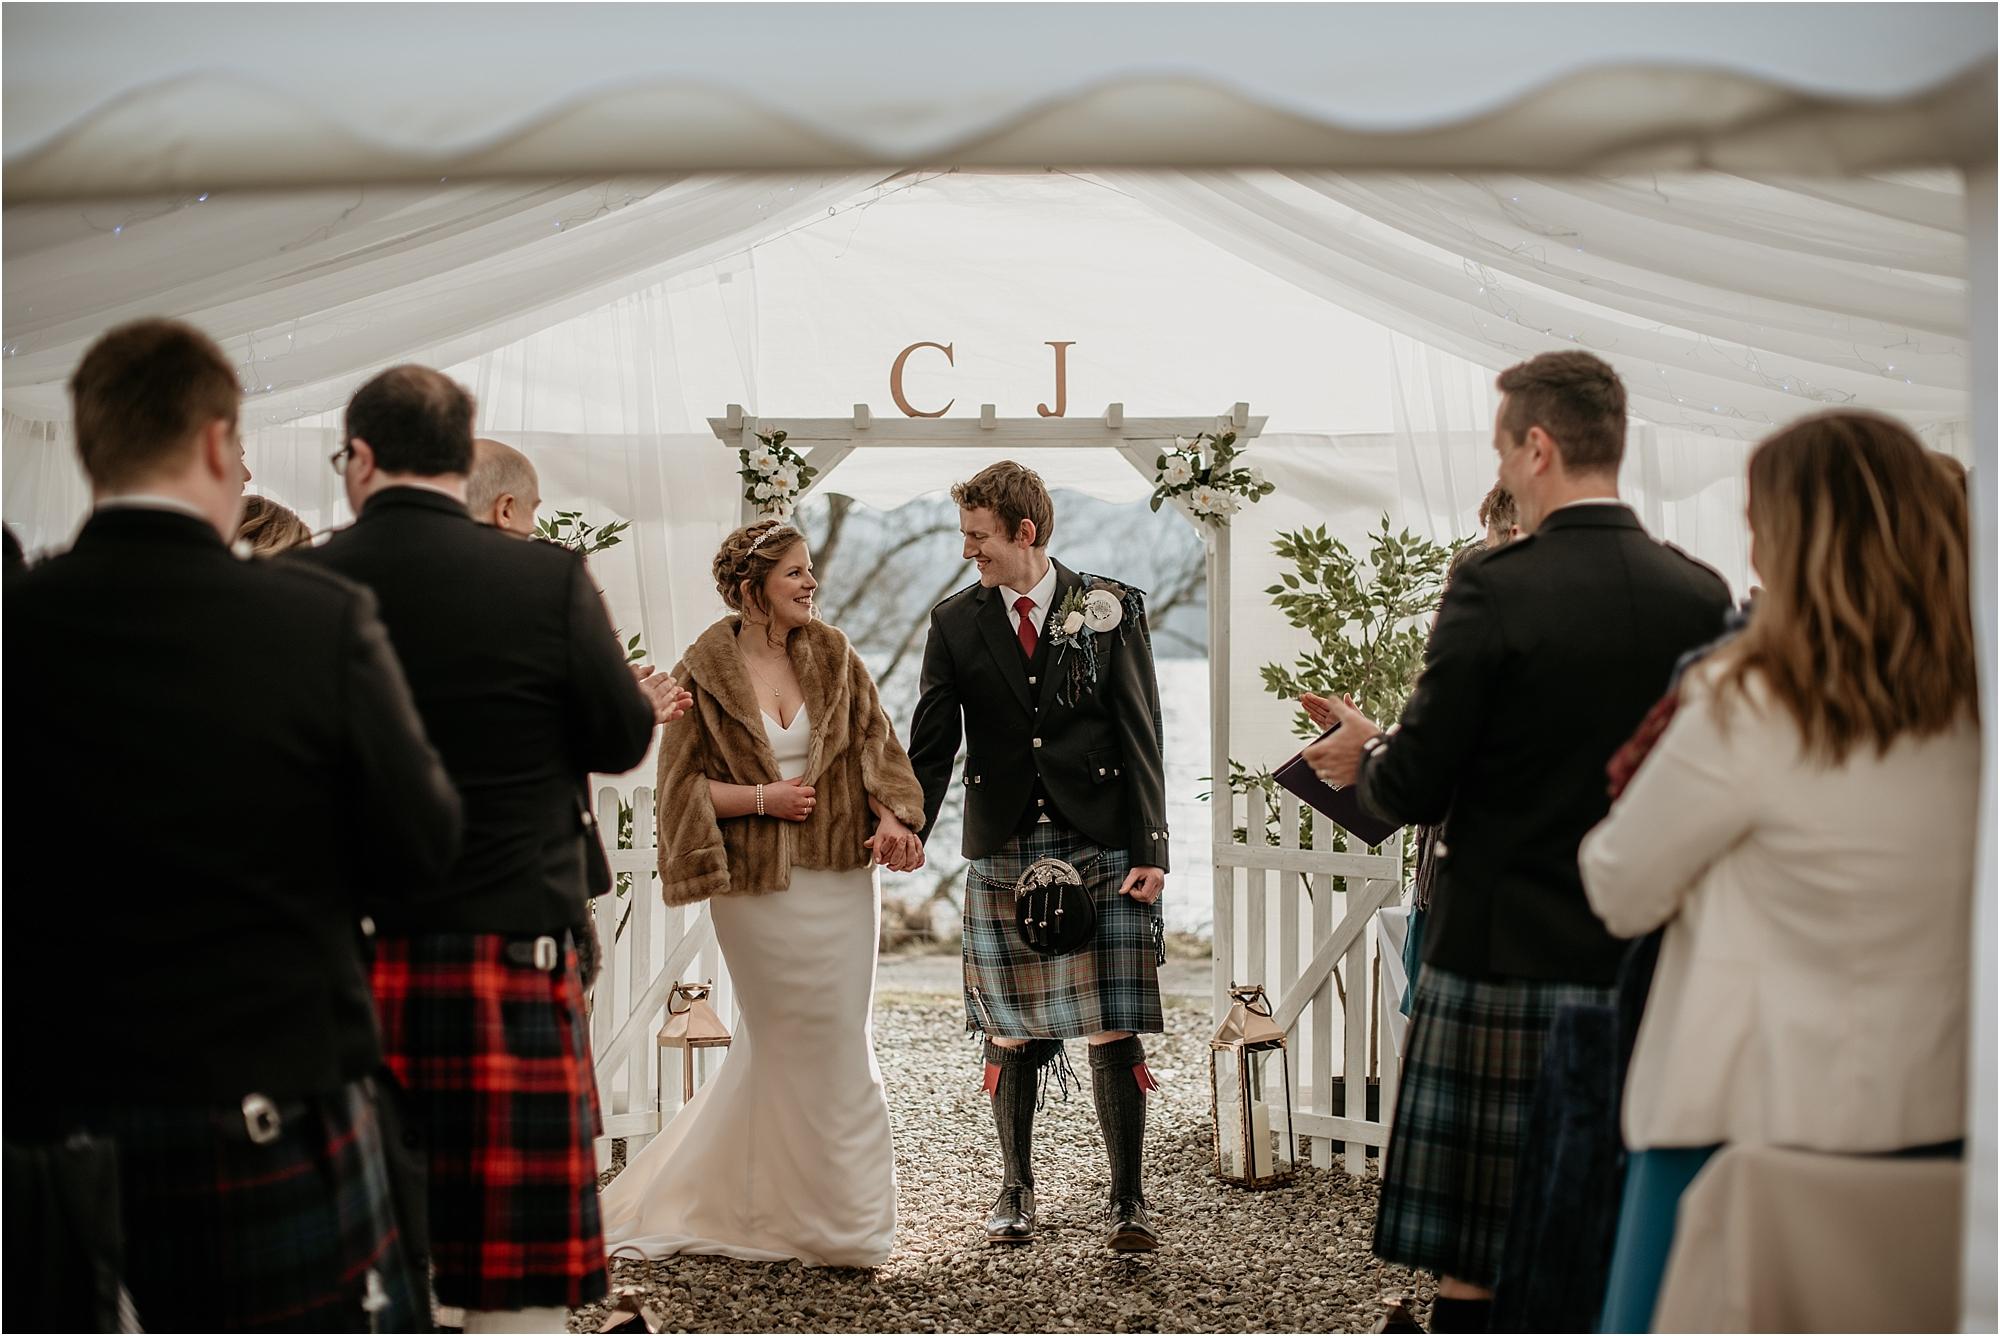 Kinlochard-village-hall-scottish-wedding-claire-fleck-photography__0033.jpg